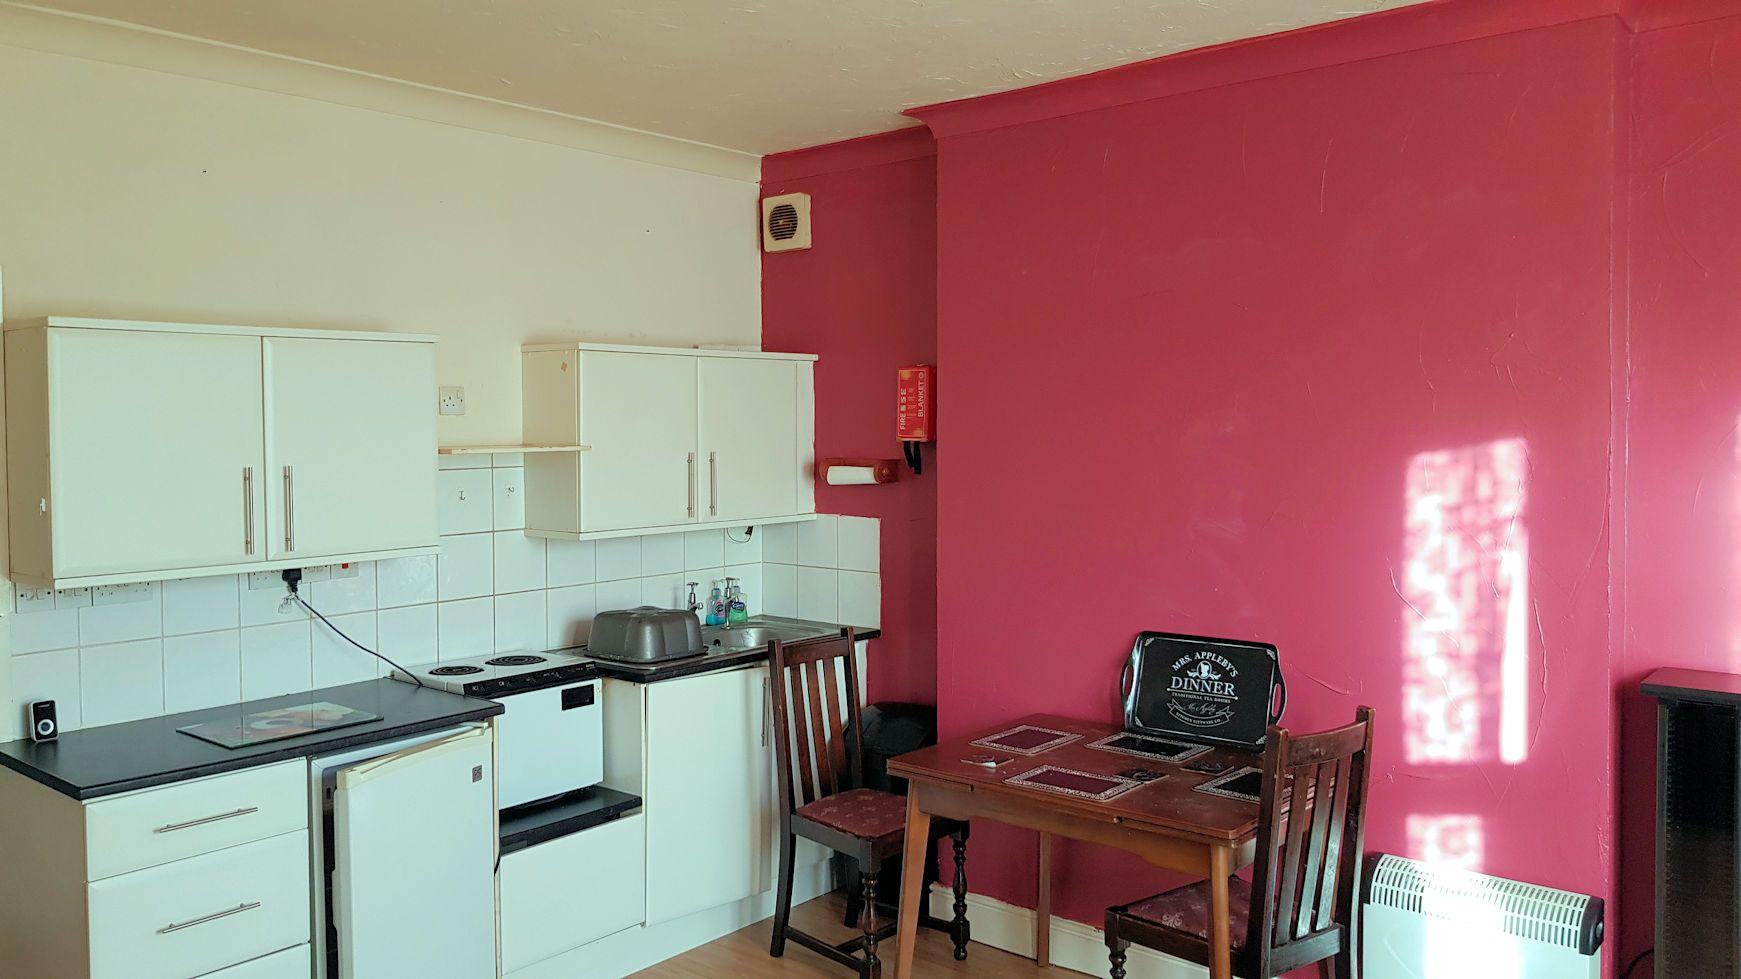 Property photo 1 of 4. Kitchen